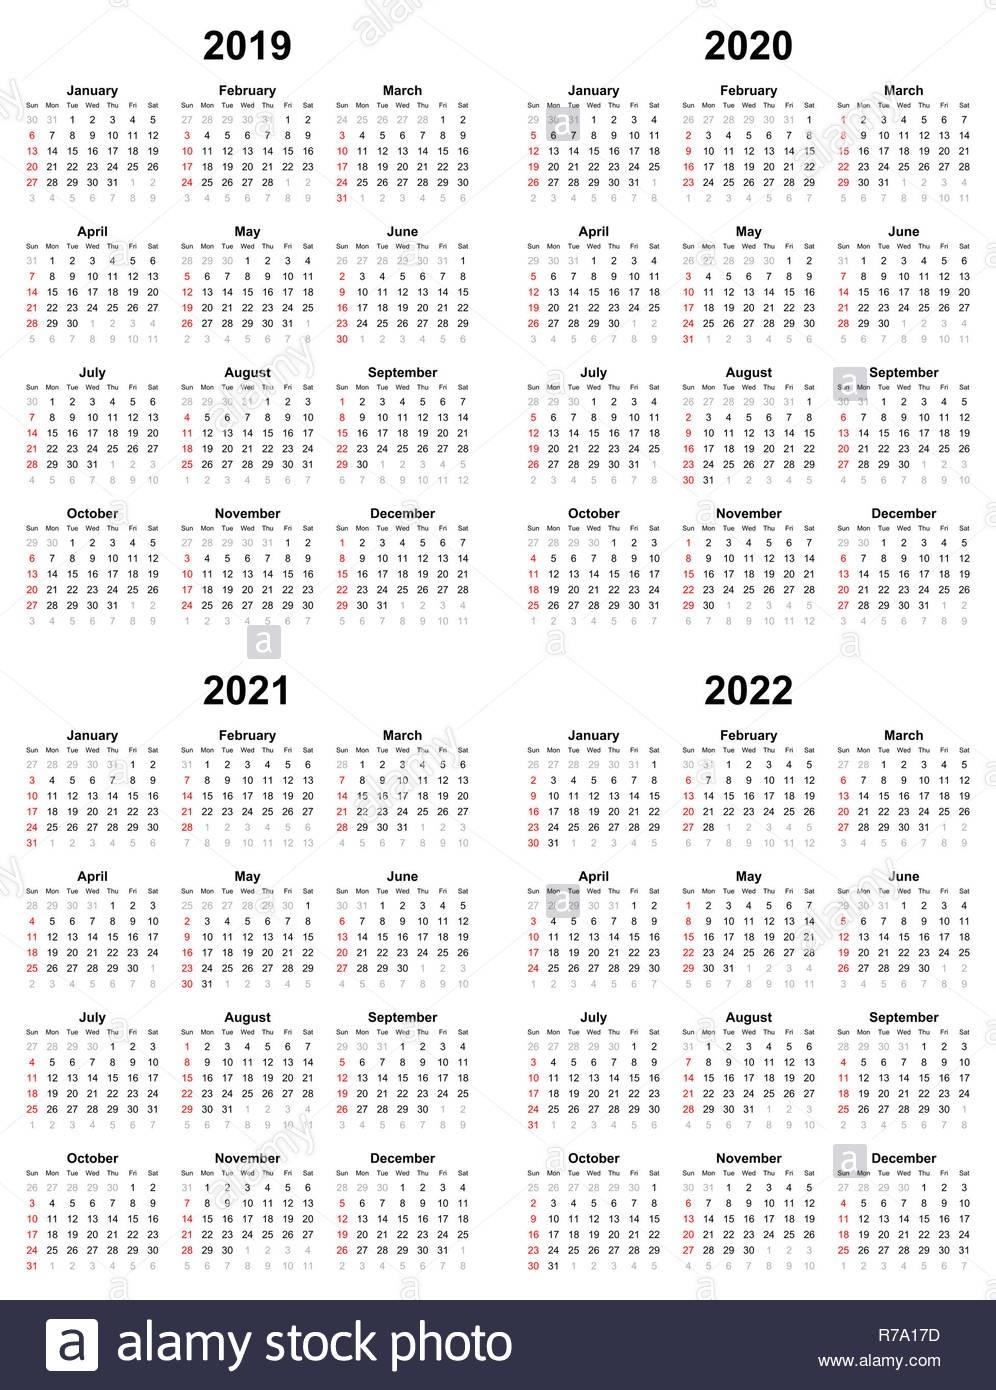 Calendario 2021 2022 Imágenes Recortadas De Stock - Alamy  Dia Juliano 2021